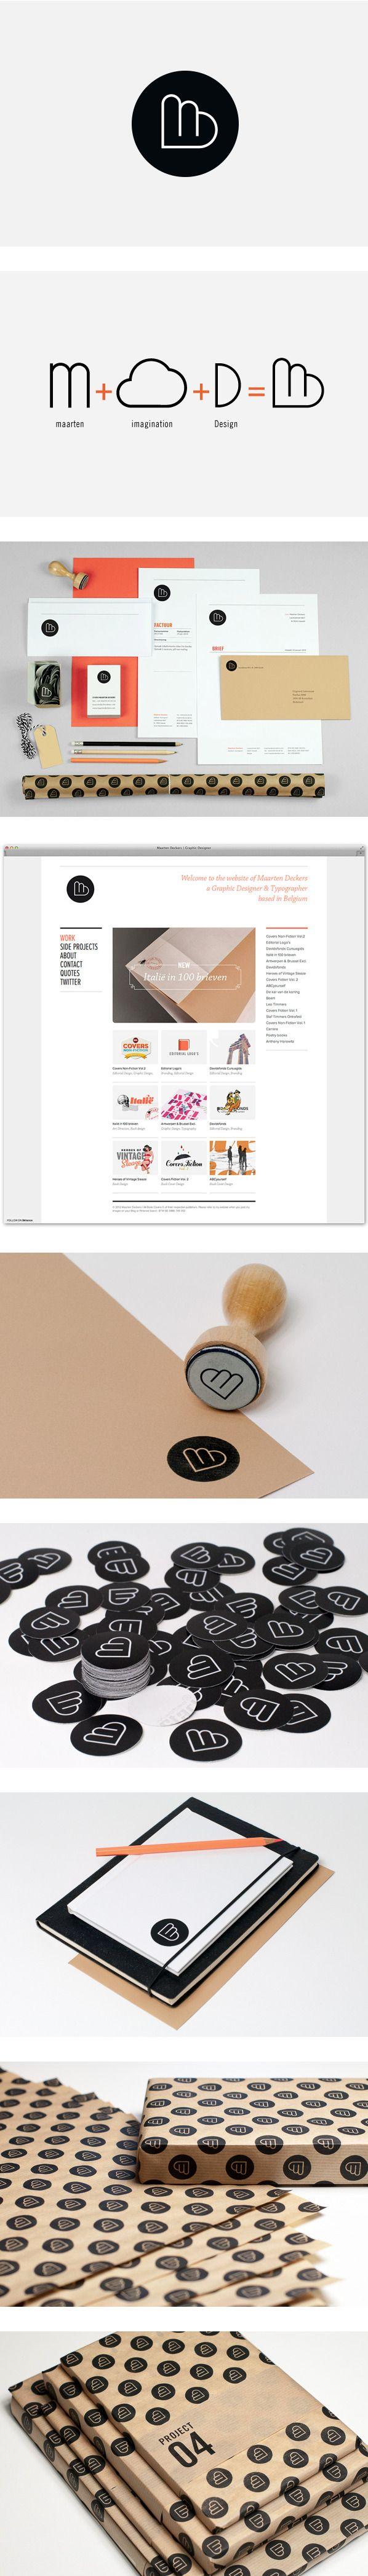 Branding Maarten Deckers by Maarten Deckers, via Behance | #stationary #corporate #design #corporatedesign #identity #branding #marketing < repinned by www.BlickeDeeler.de | Take a look at www.LogoGestaltung-Hamburg.de